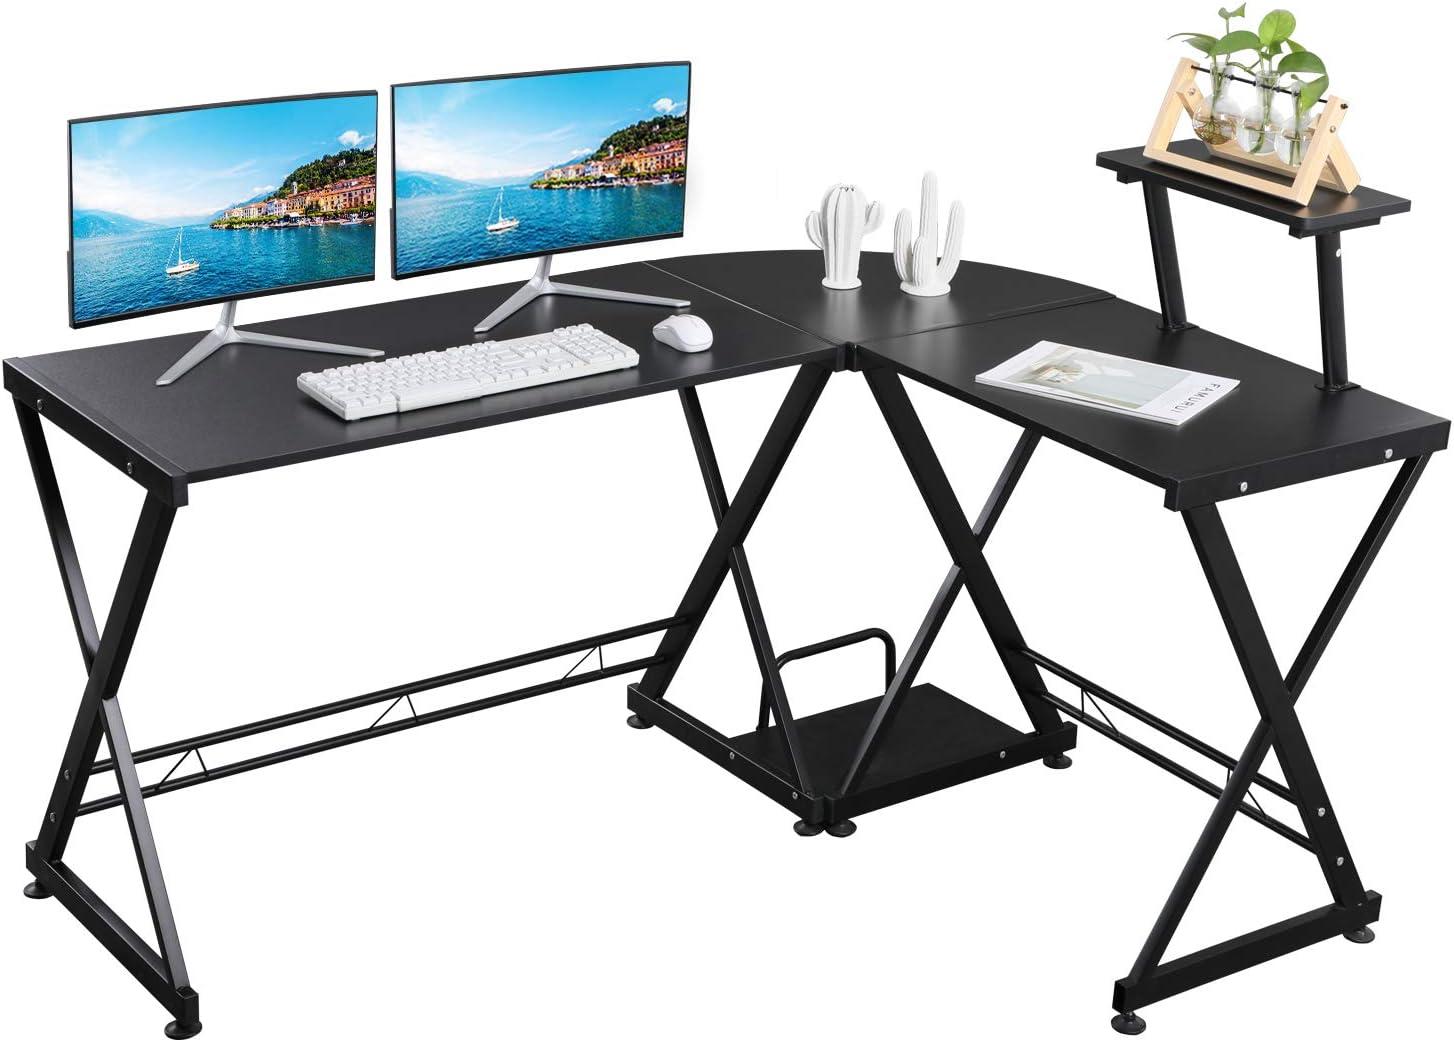 GreenForest L Shaped Office Computer Corner Desk with Storage Shelf PC Table Workstation for Home Office, Black